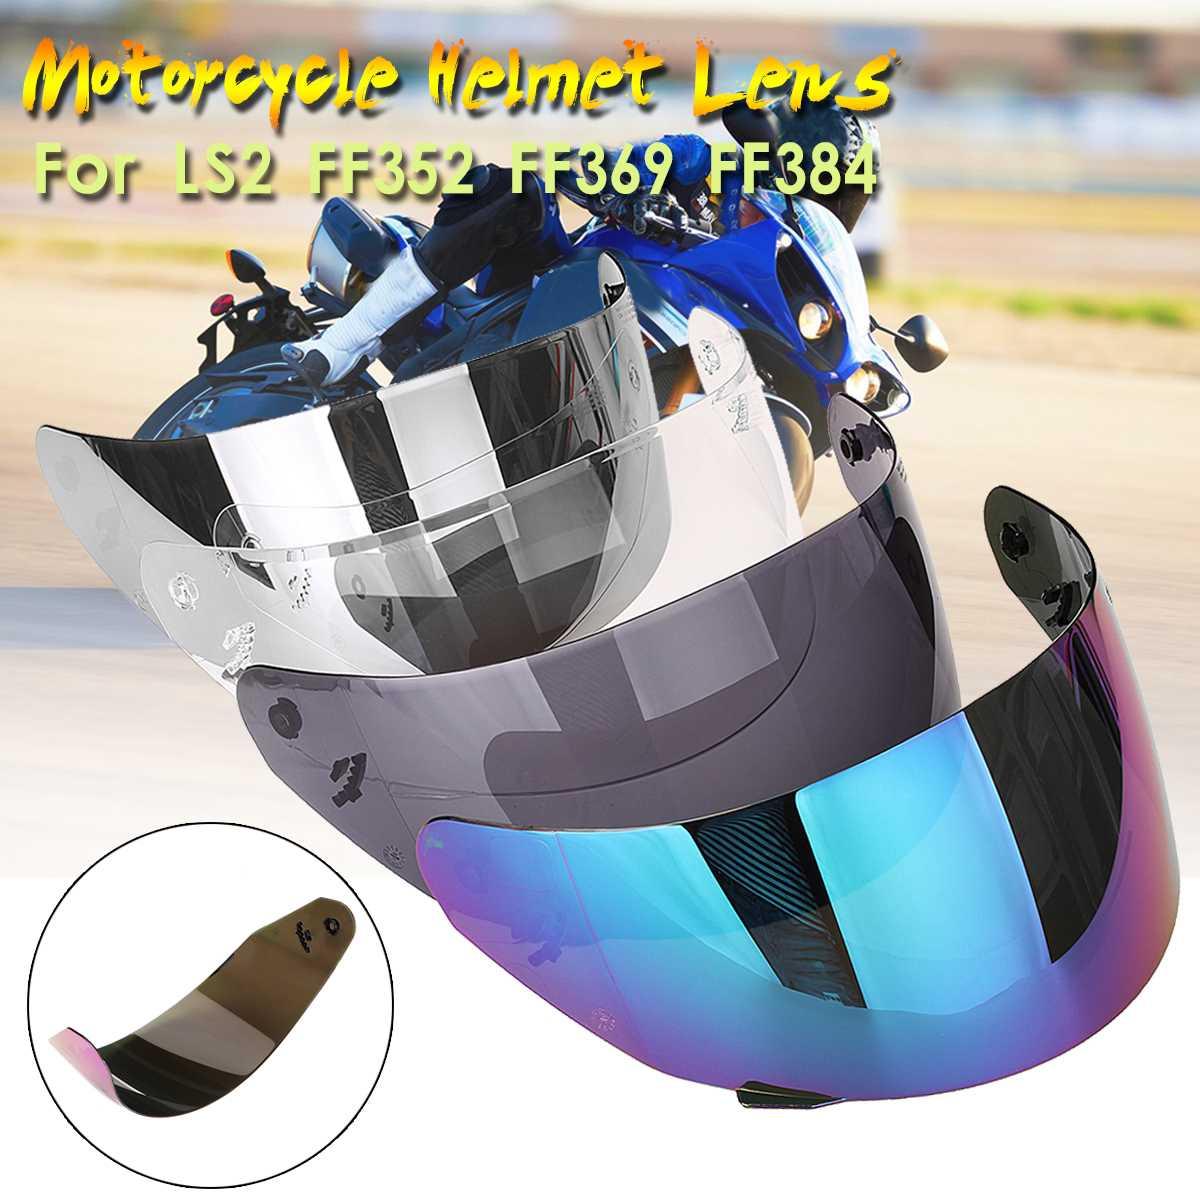 Fumaça colorida lente capacete rosto cheio viseira capacete da motocicleta para ls2 ff352 ff351 ff369 ff384